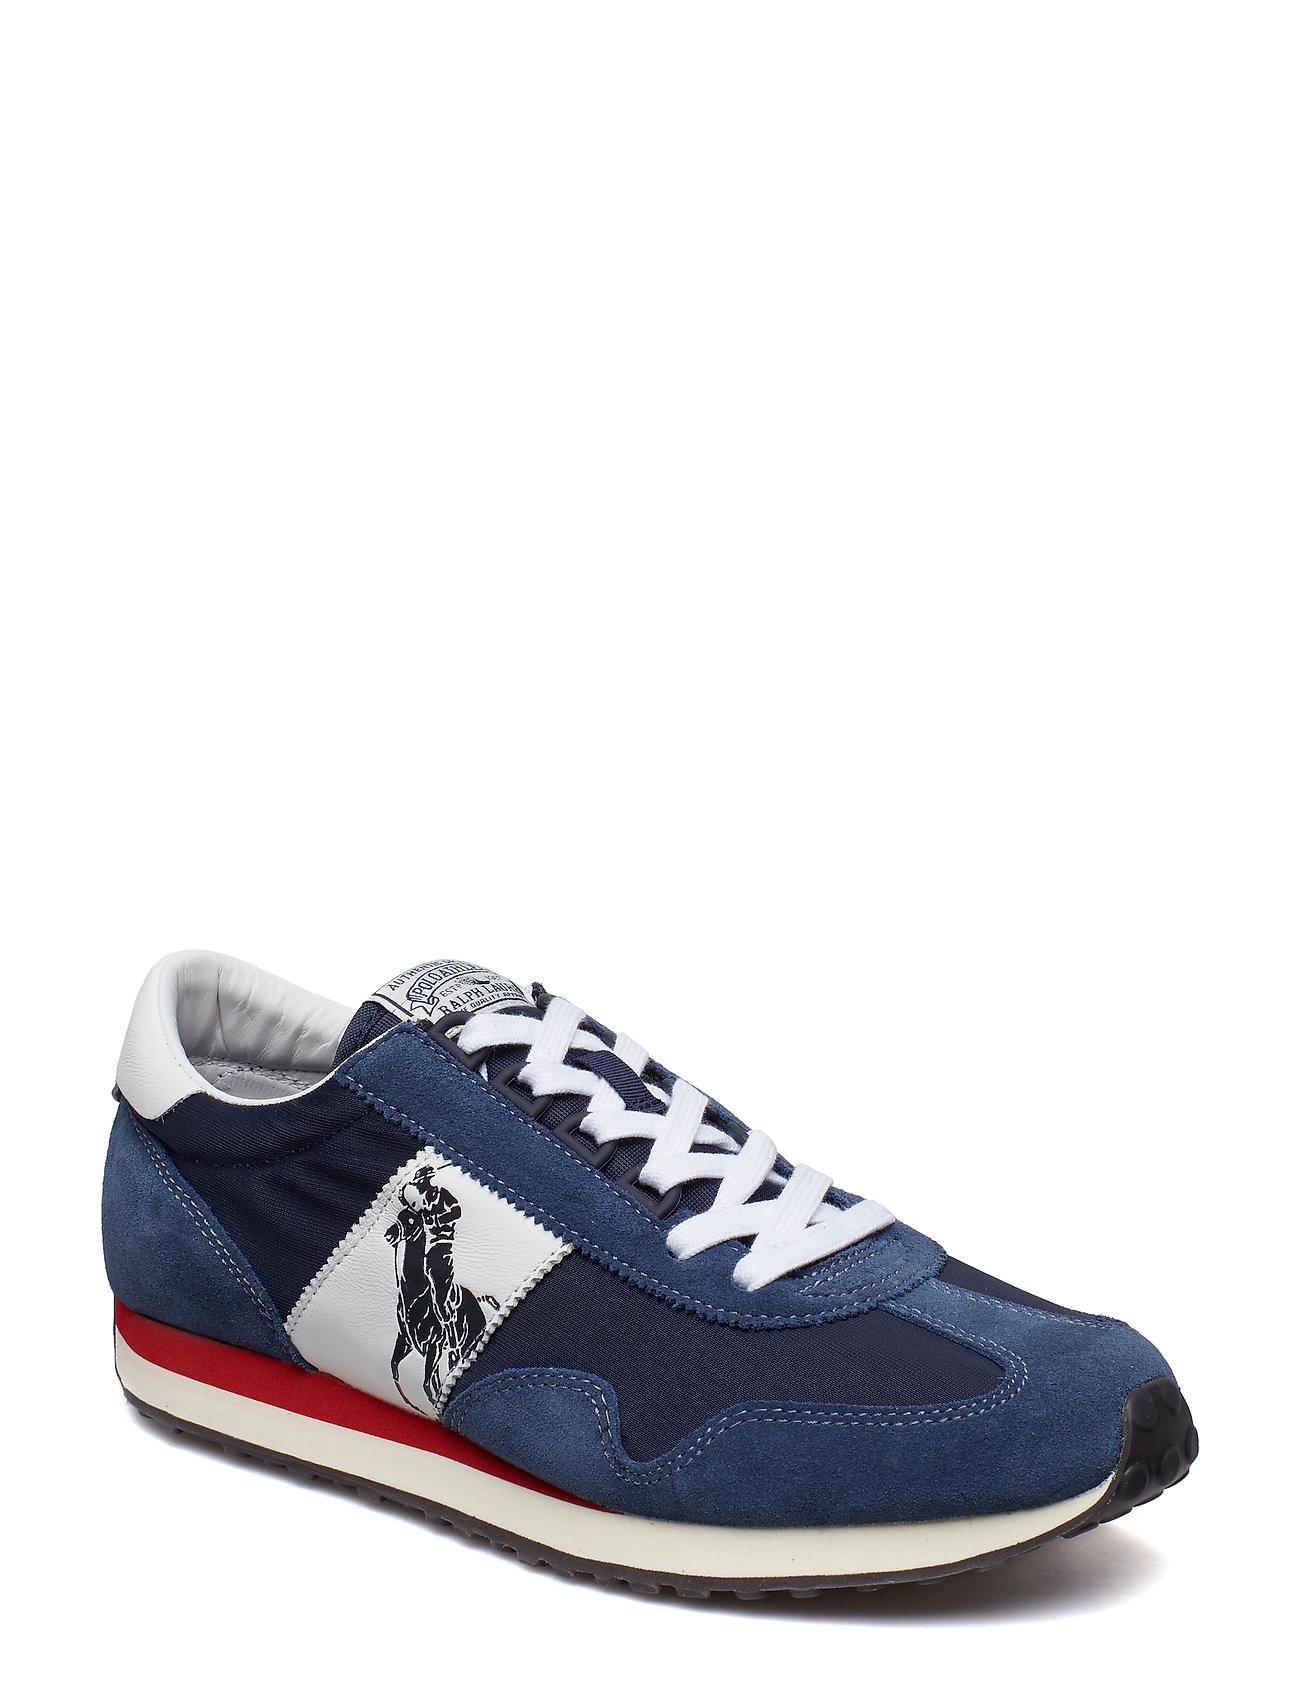 Polo Ralph Lauren Train 90 Sneaker